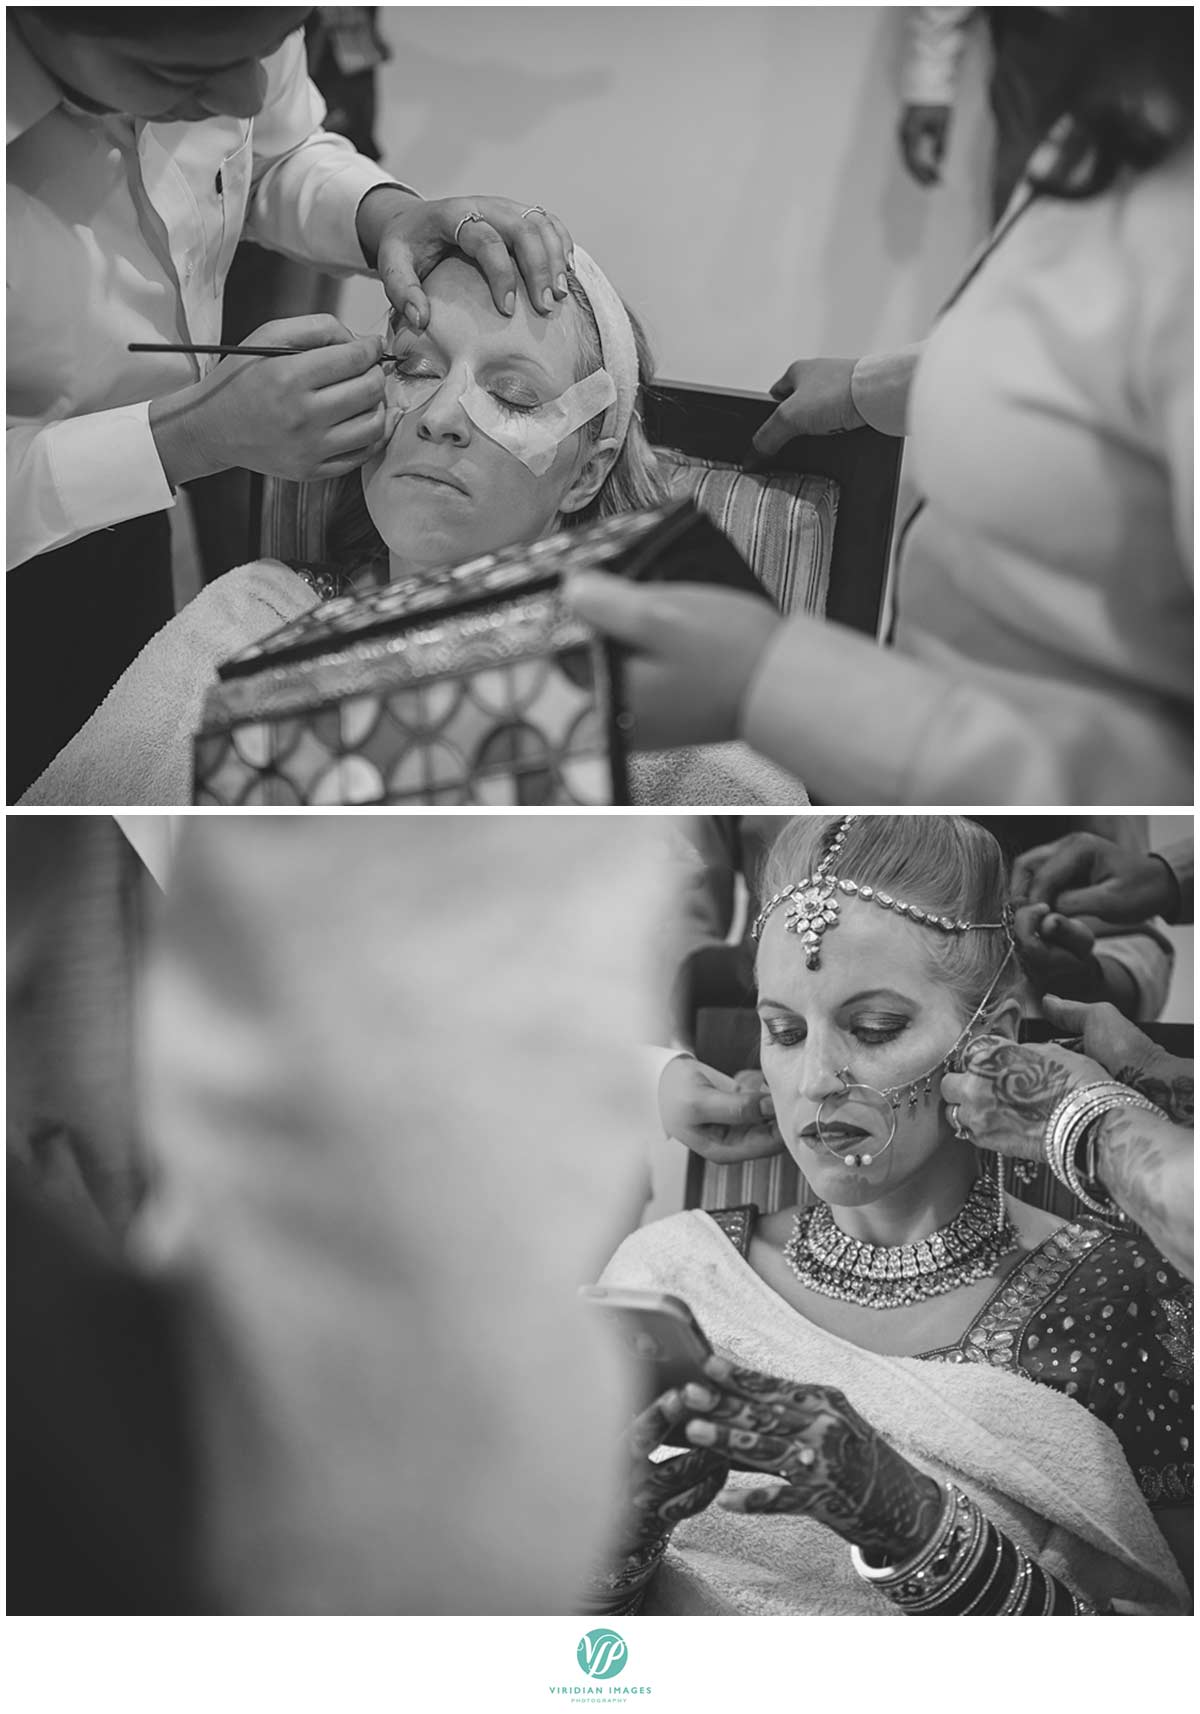 India_Chandigarh_Wedding_Viridian_Images_Photography_poto_2